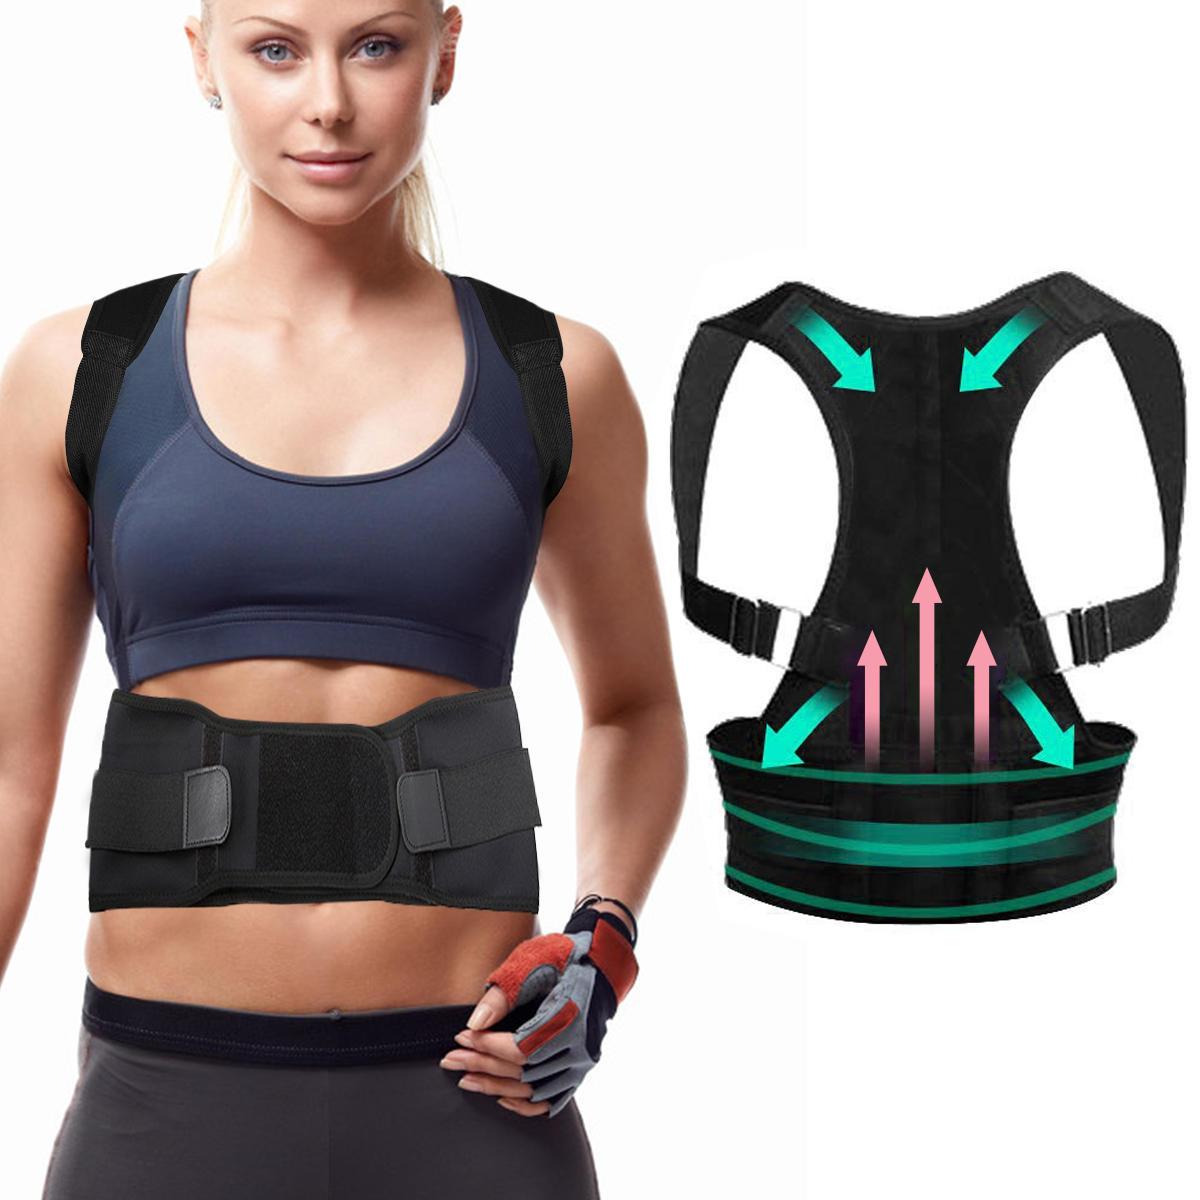 CHARMINER® Back Support Straight Posture Corrector Shoulder Back Trainer Fitness Protective Gear